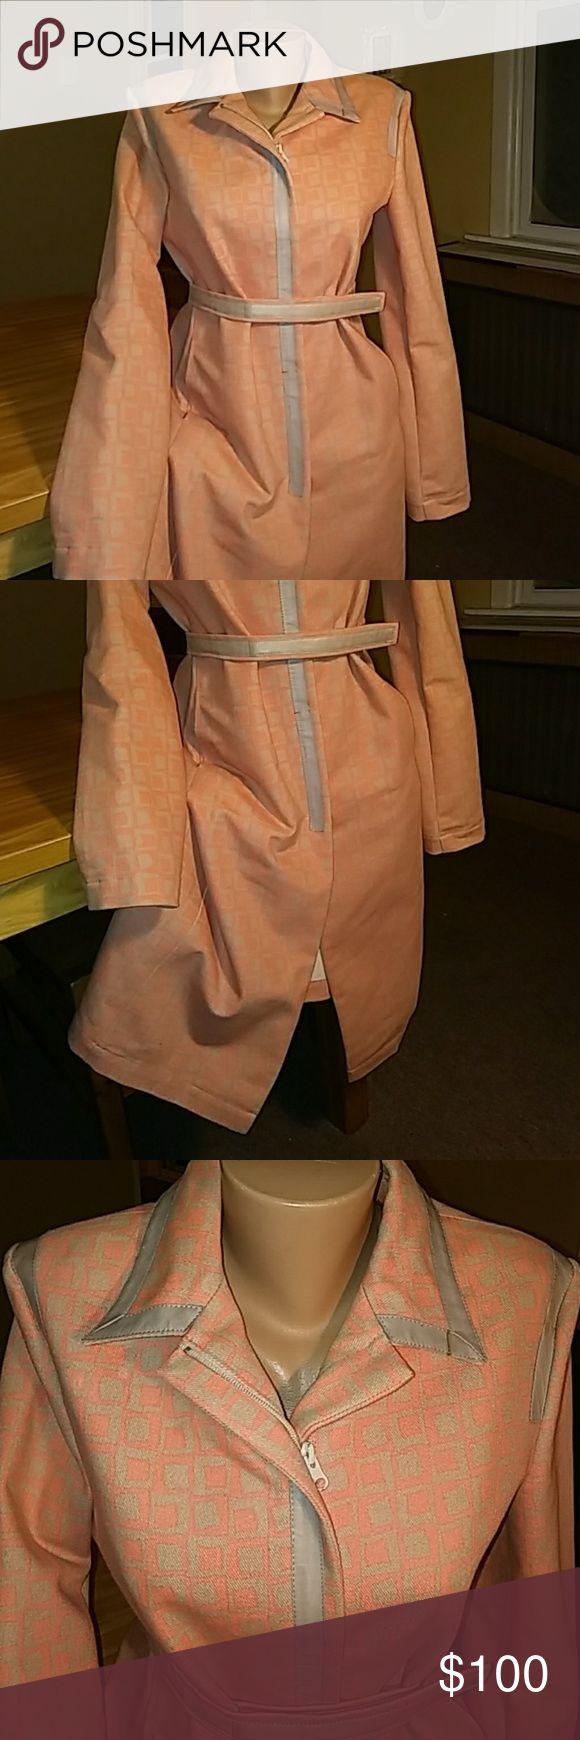 PF PAOLA FRANI Pre luved long coat jacket Paola Frani Jackets & Coats